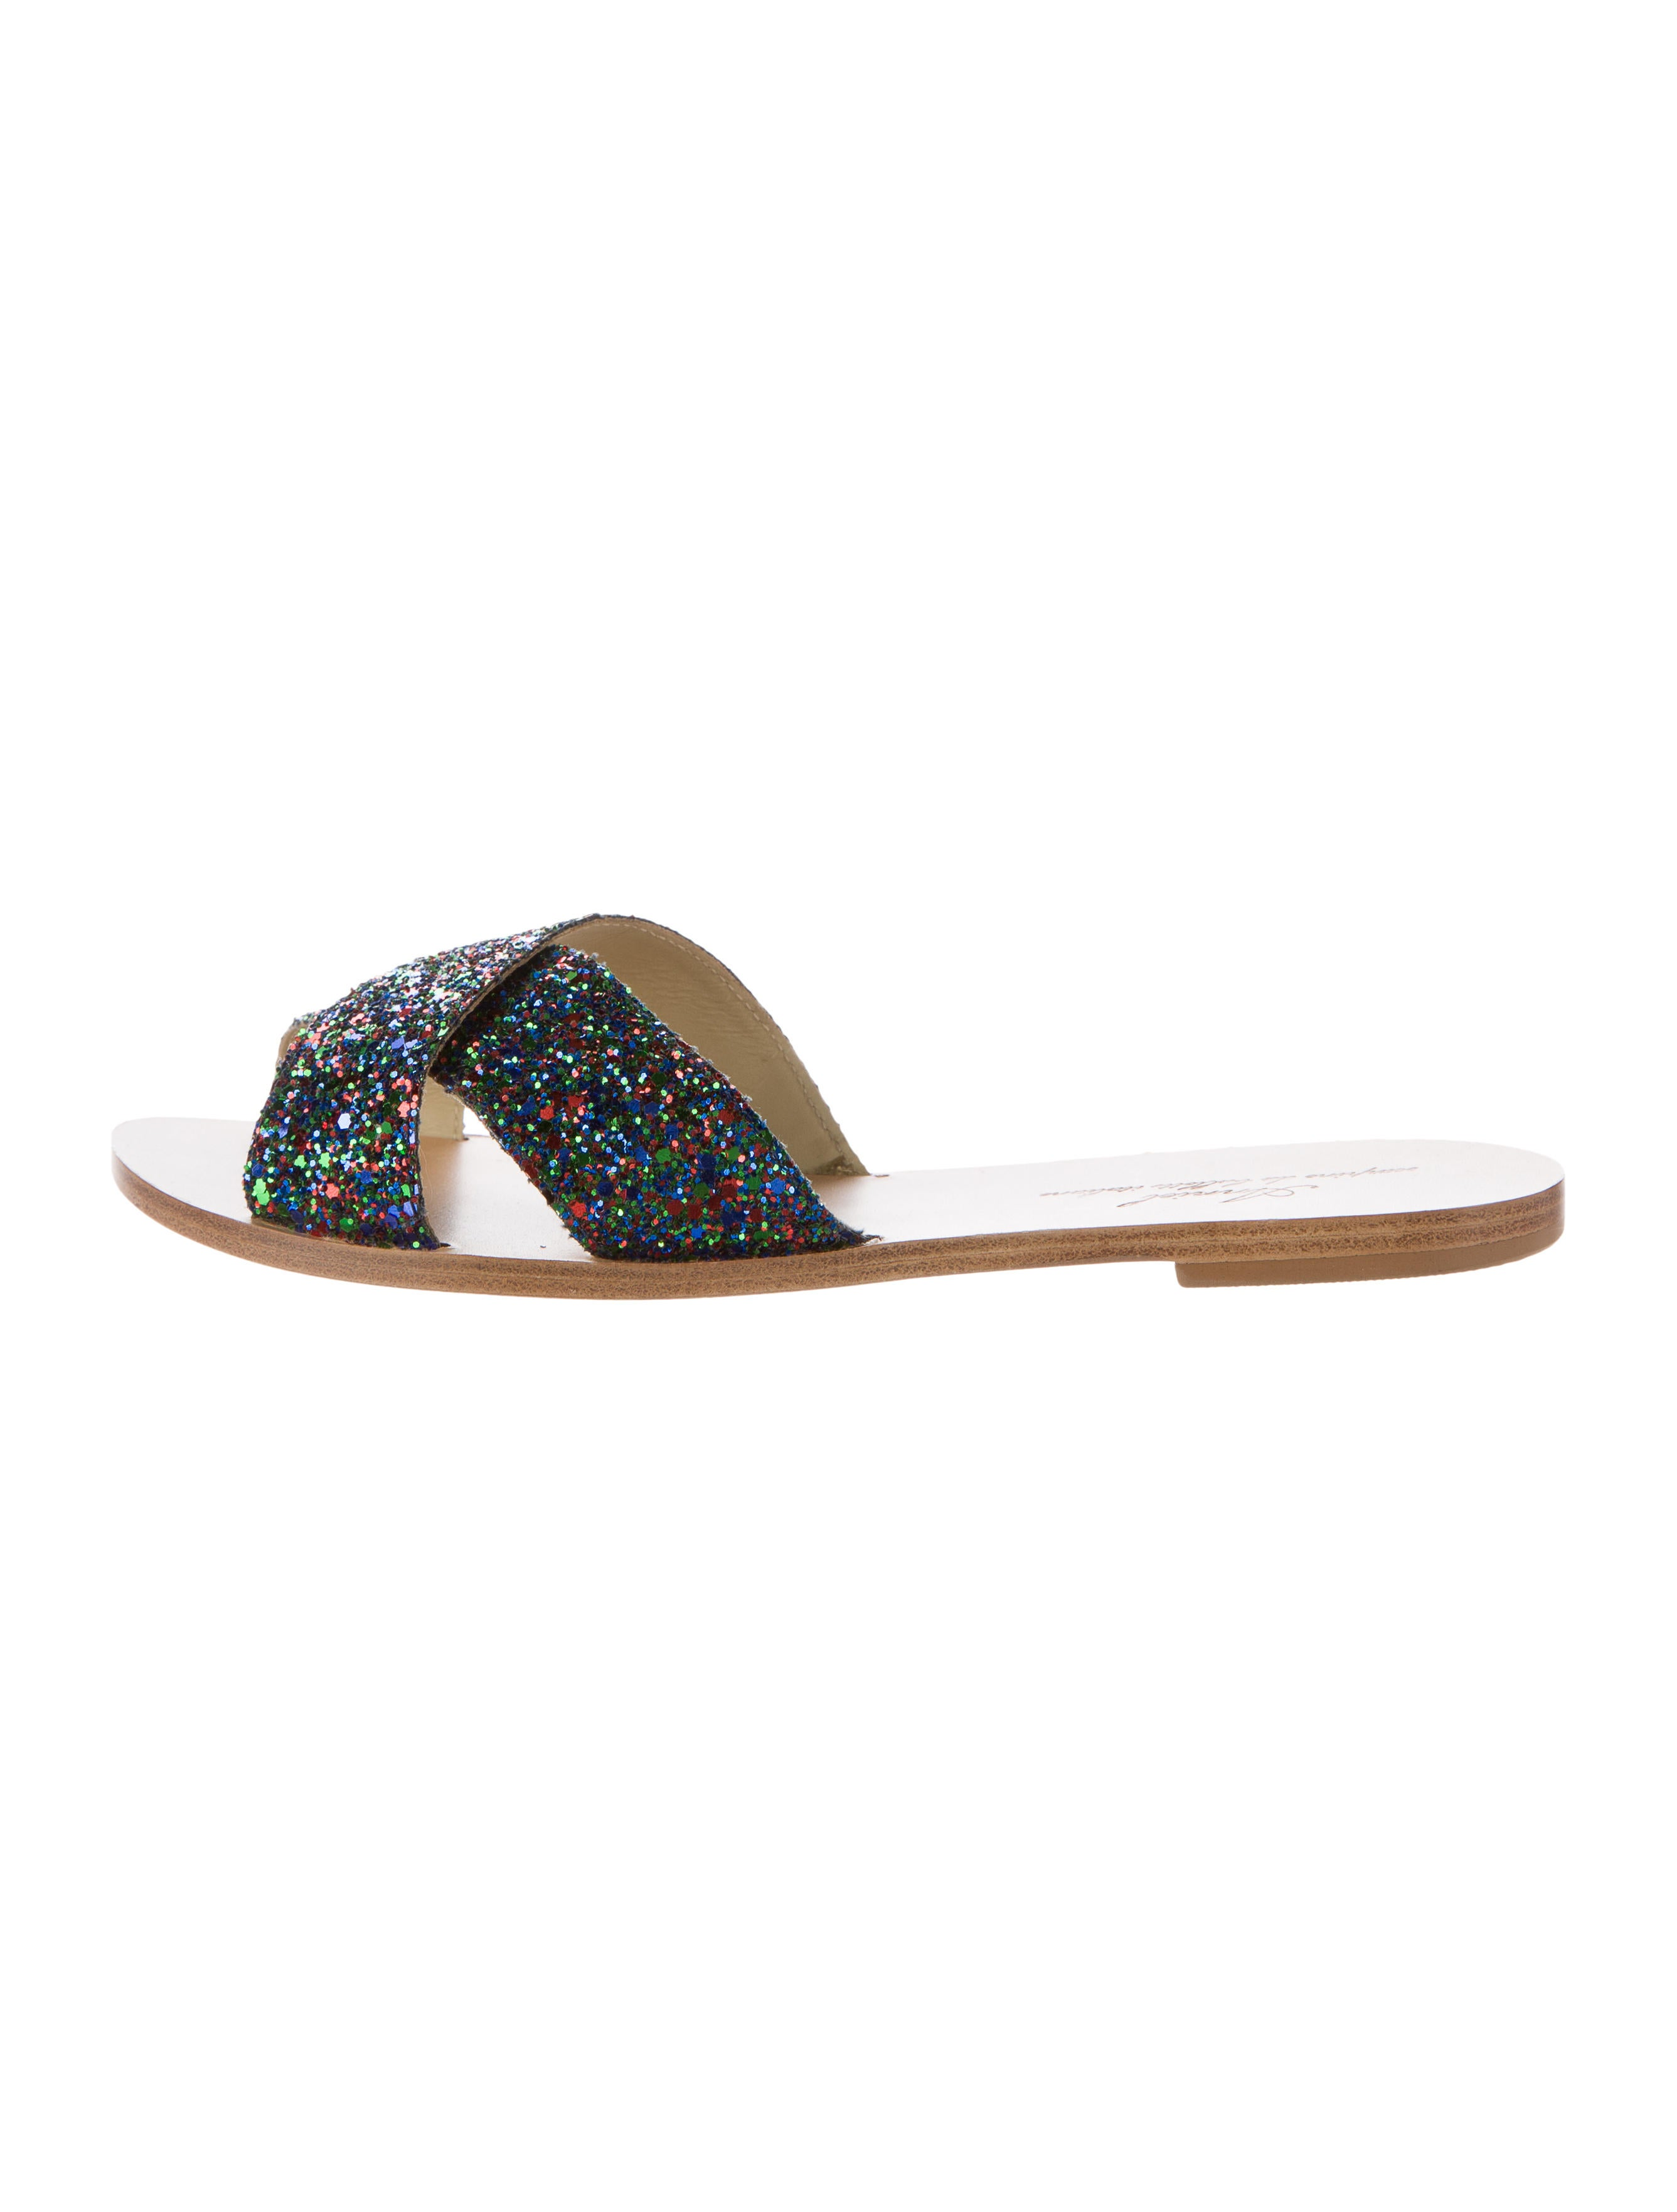 professional sale how much Anniel Glitter Slide Sandals sale cheap outlet store cheap online kLeiE